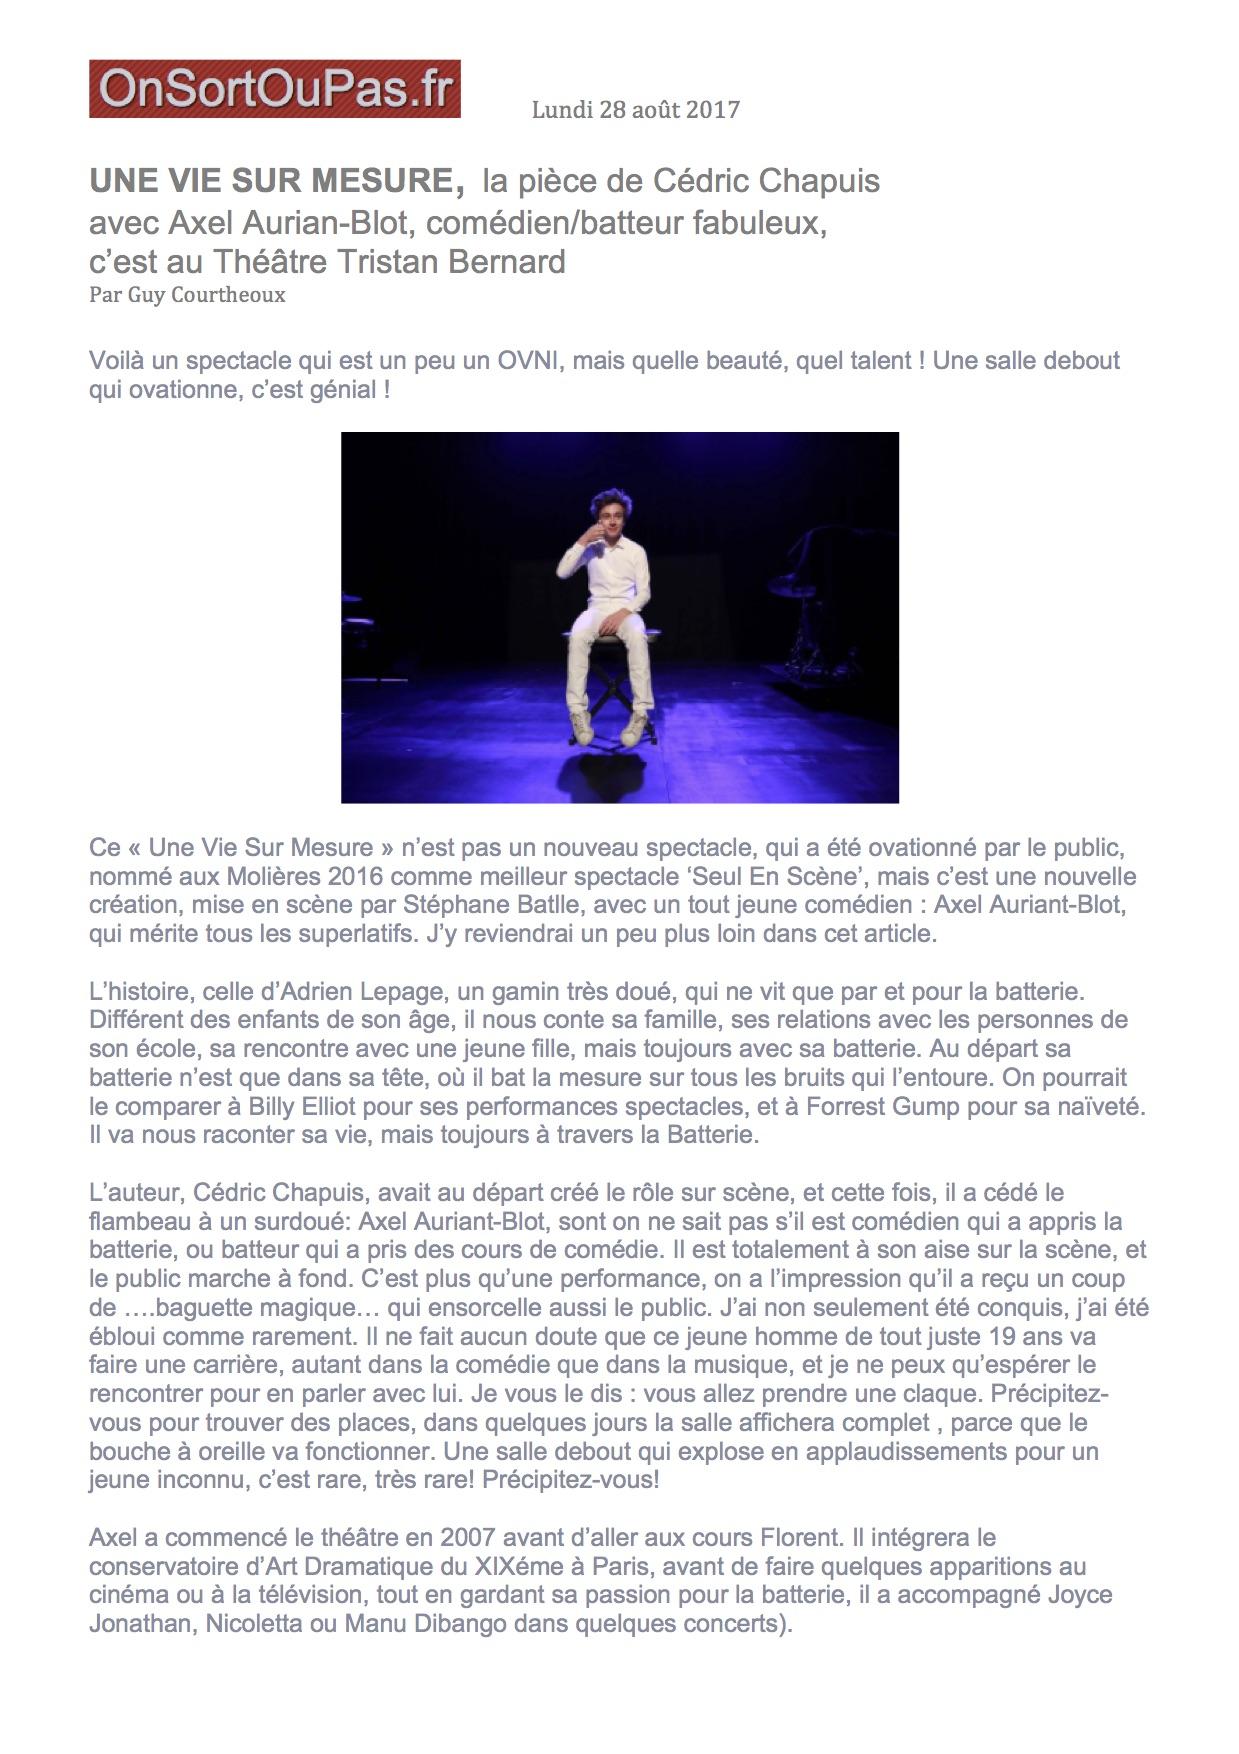 Onsortoupas.fr 28.08.17